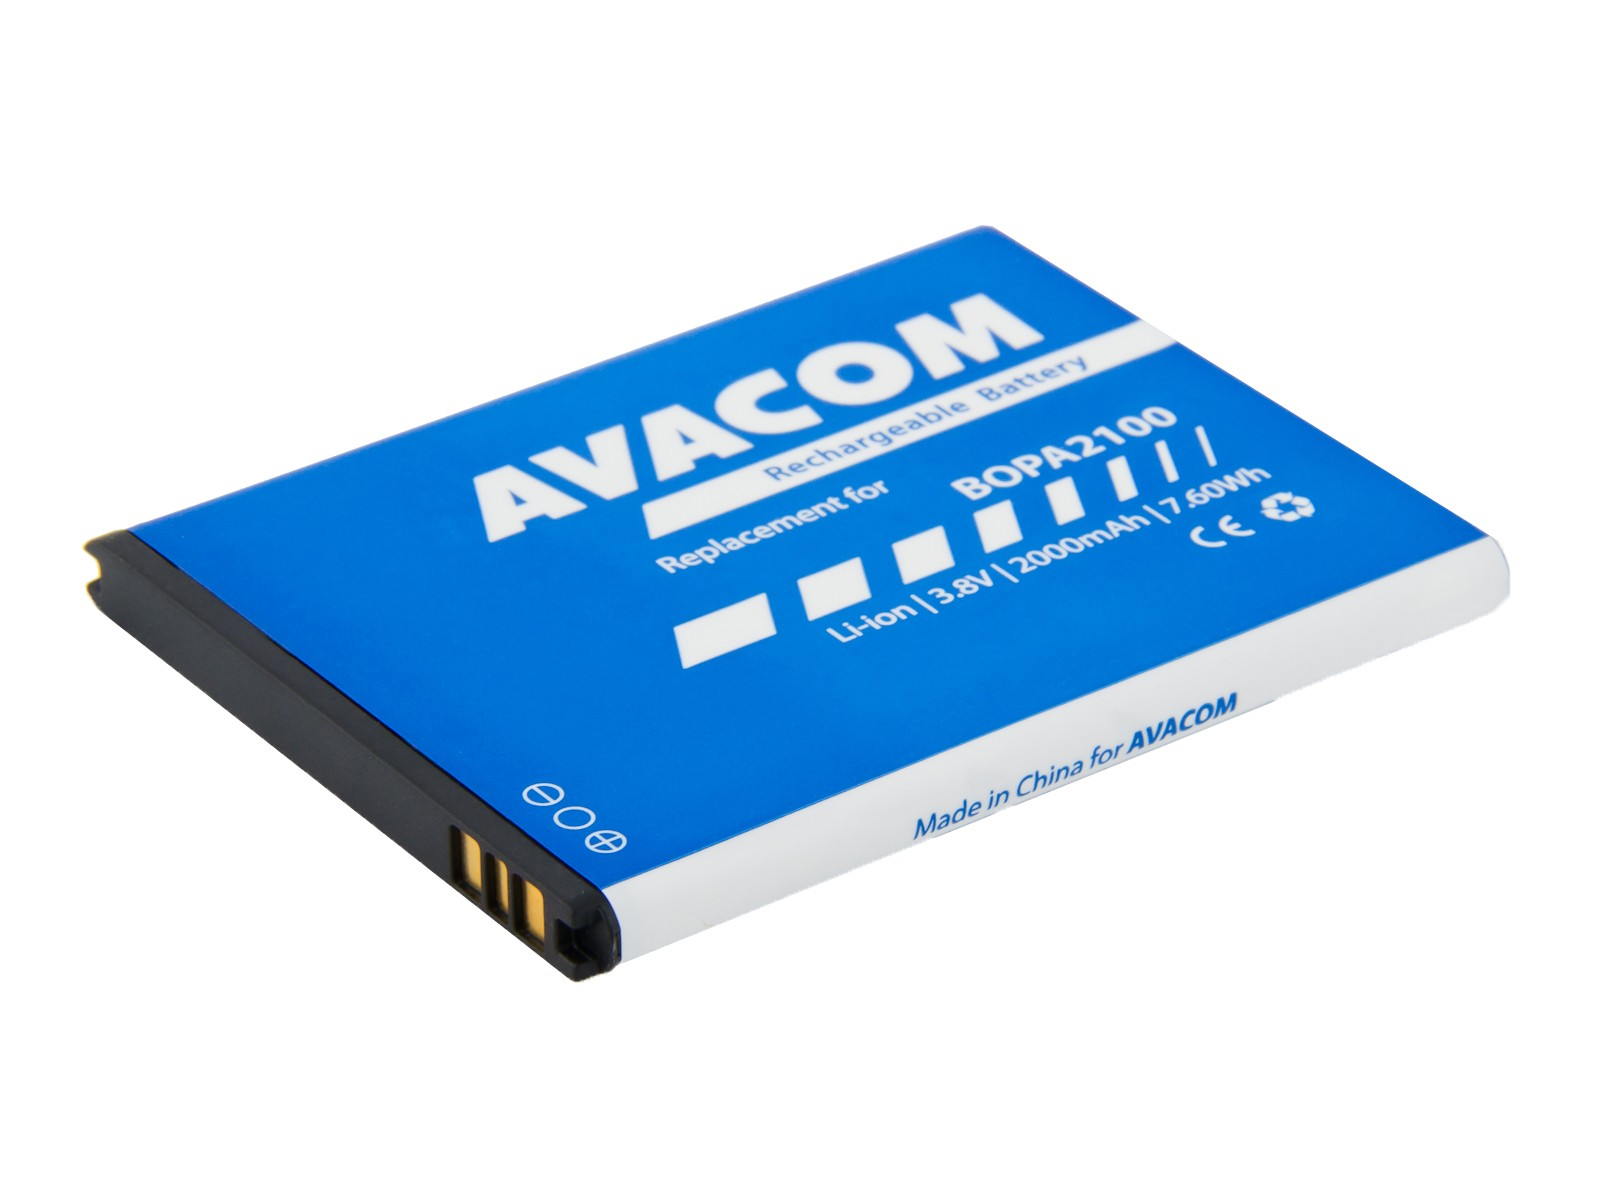 Baterie AVACOM PDHT-DESI310-2000 do mobilu HTC Desire 310 Li-Ion 3,8V 2000mAh, (náhrada BOPA2100)